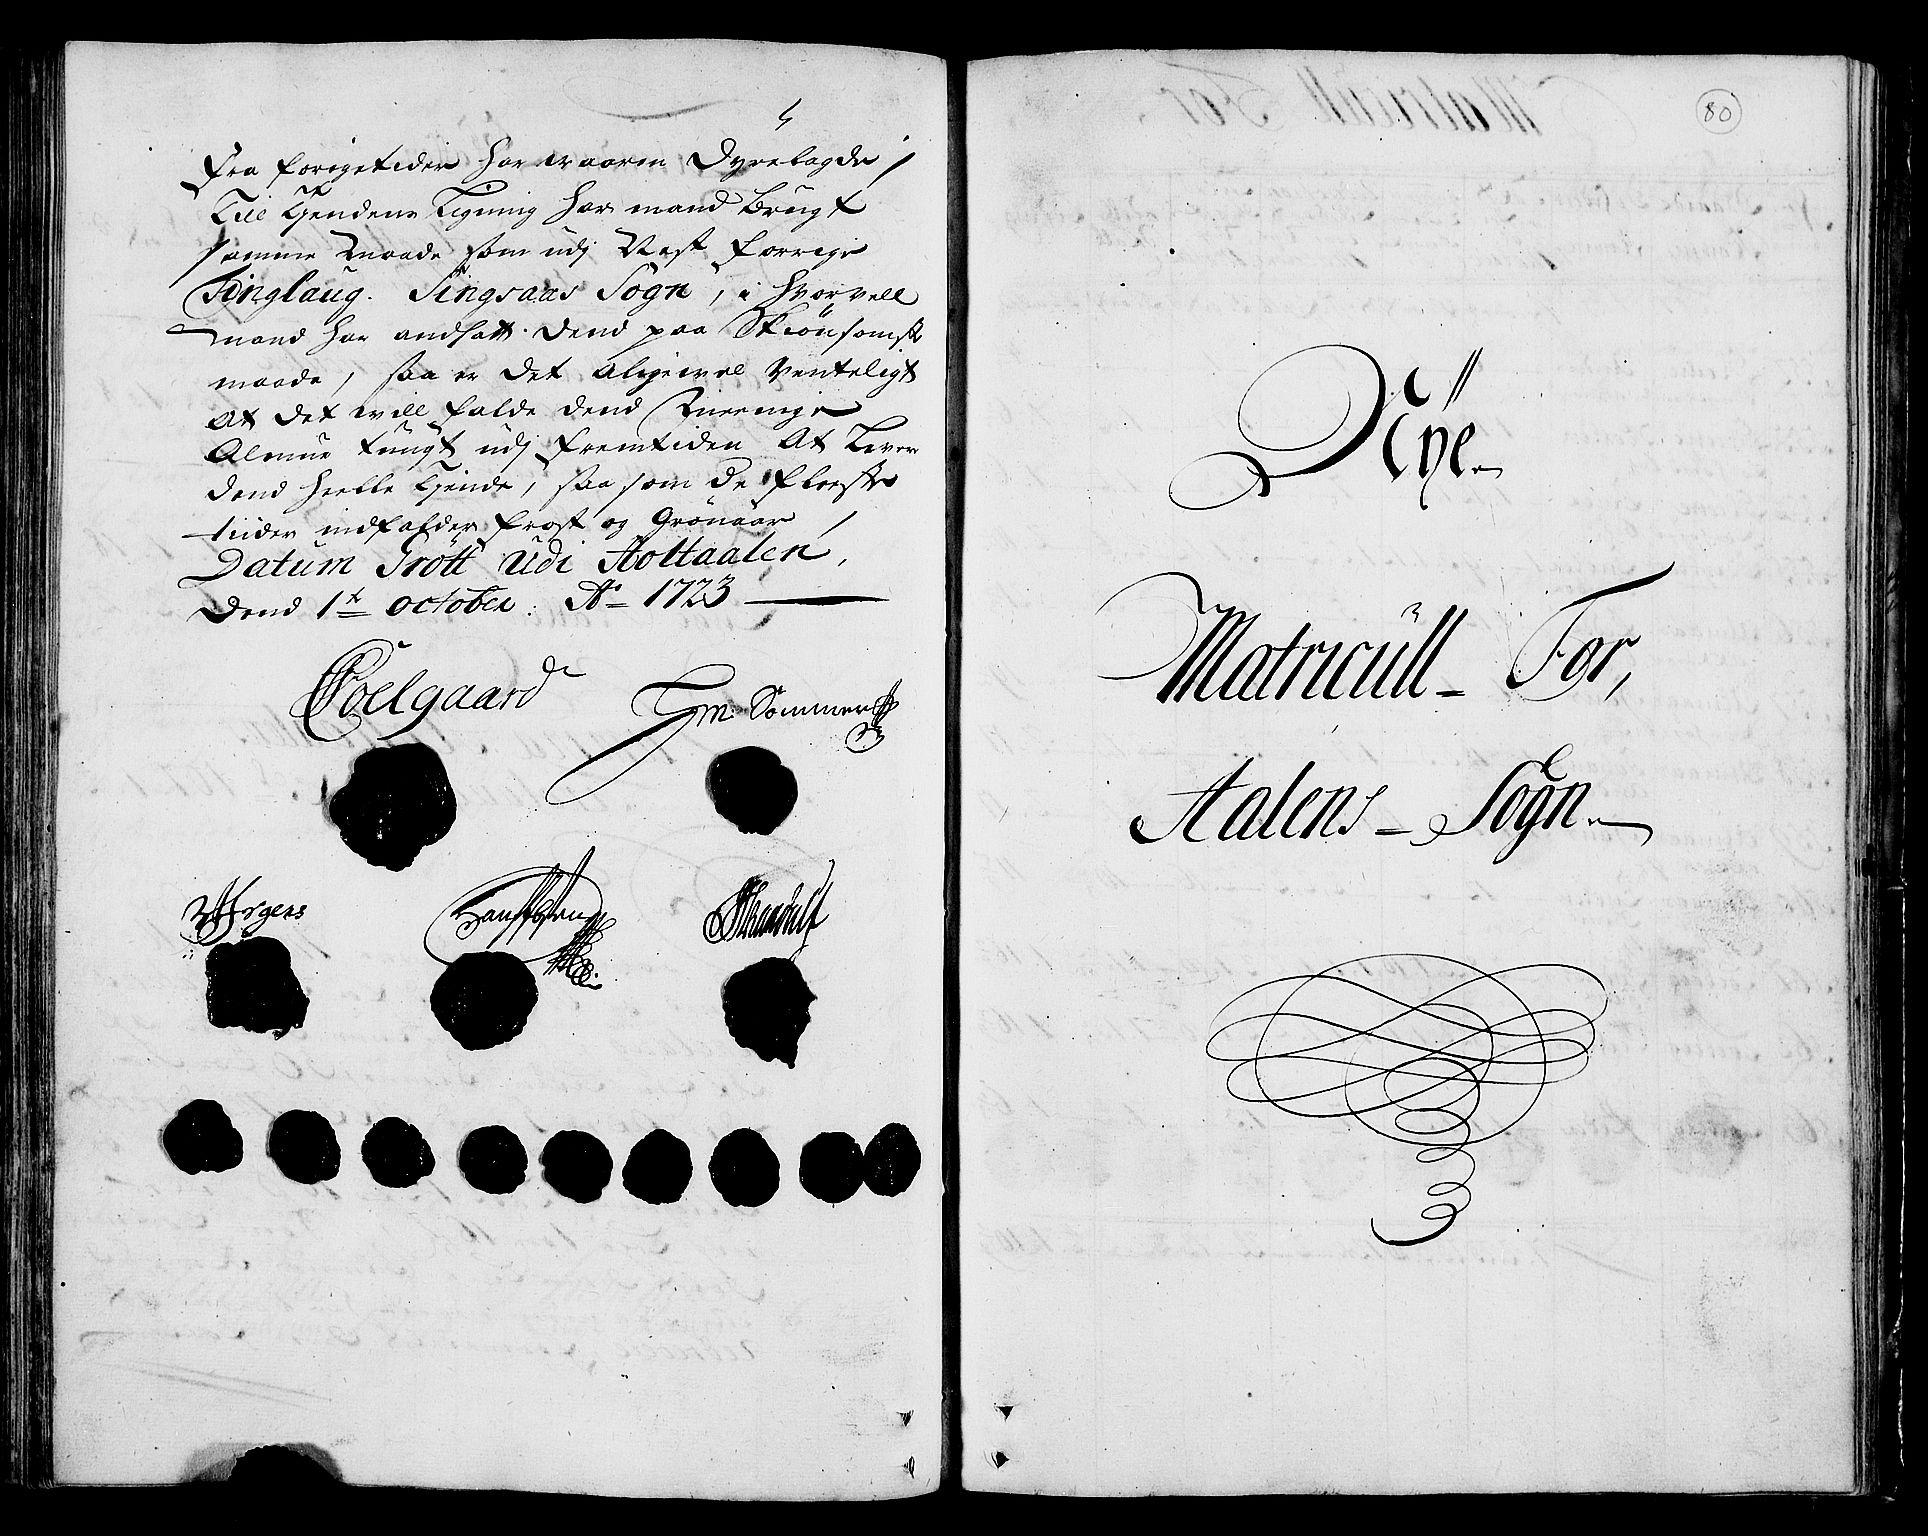 RA, Rentekammeret inntil 1814, Realistisk ordnet avdeling, N/Nb/Nbf/L0159: Gauldal matrikkelprotokoll, 1723, s. 79b-80a